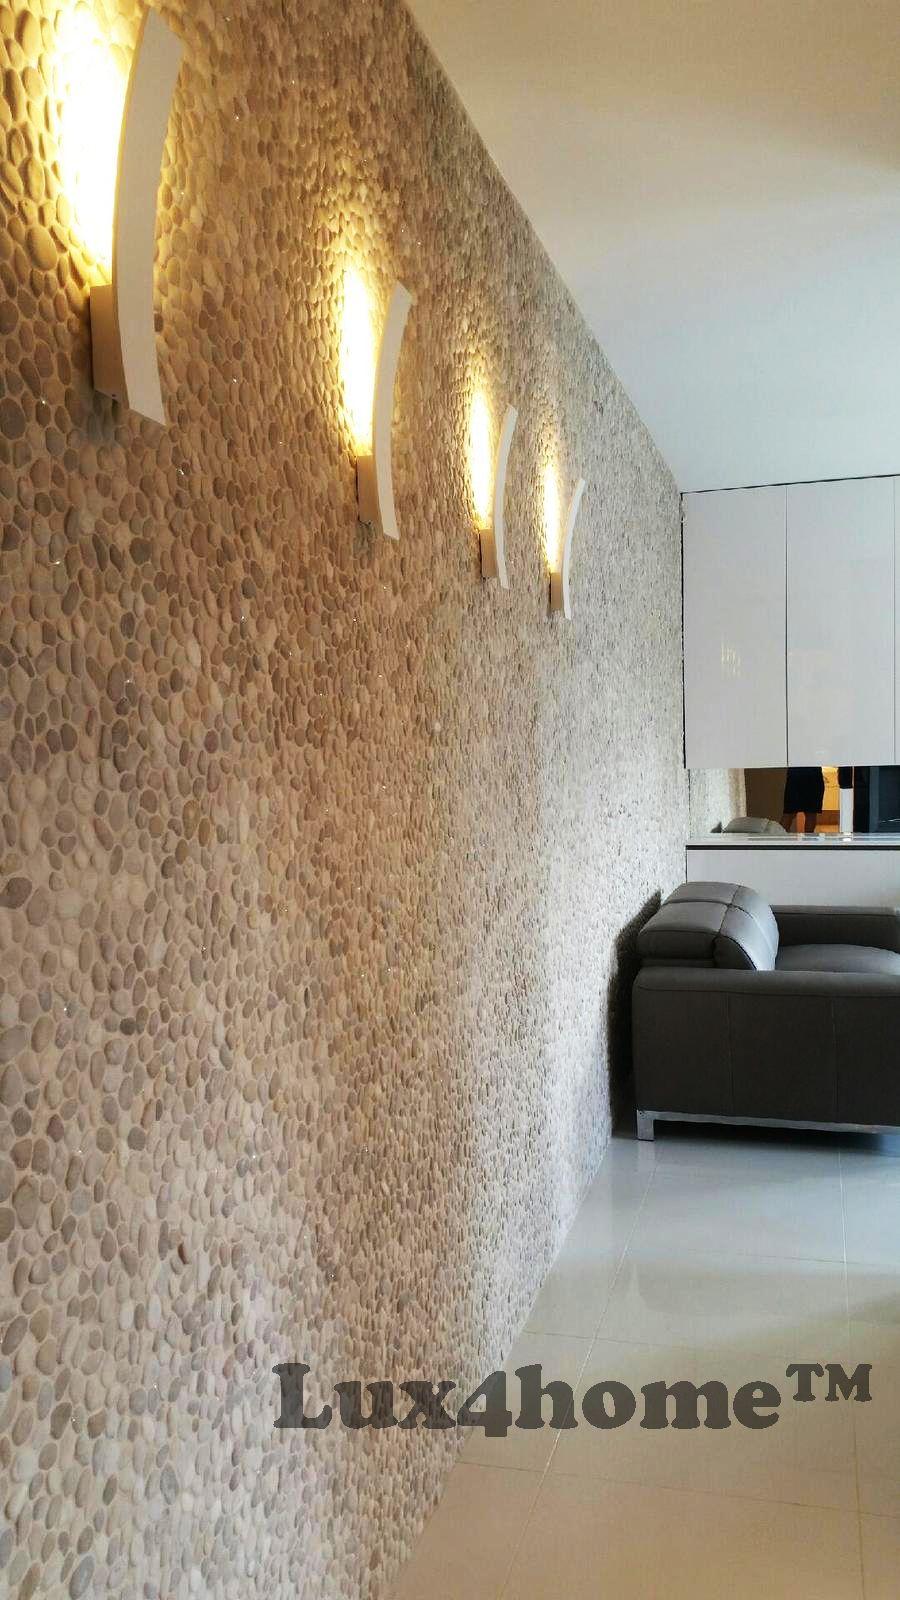 Luxury apartment with #Pebble #Tiles on walls. #Beige Pebble Tiles ...